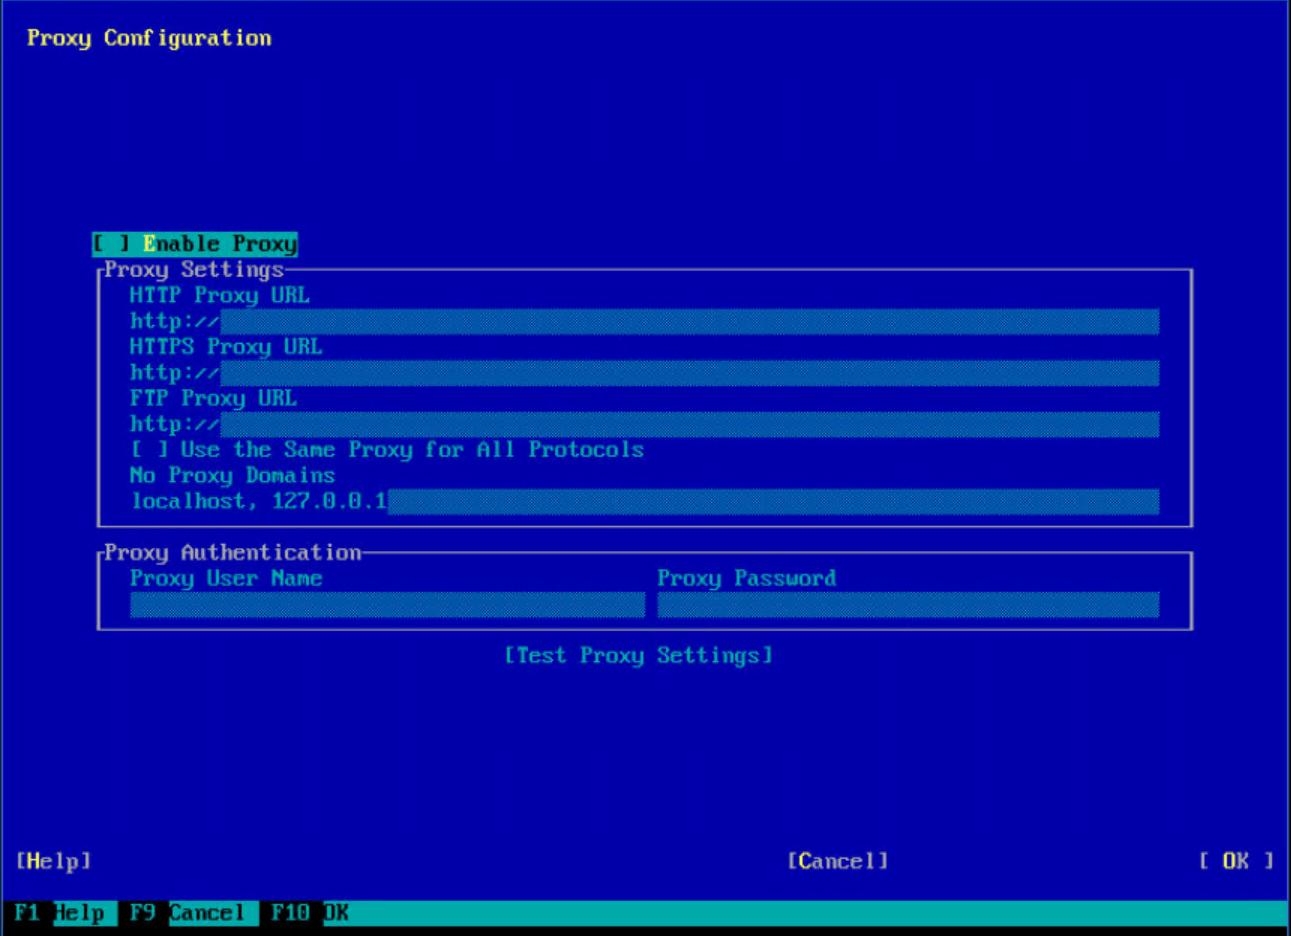 domalab.com Turbonomic IP Proxy setup